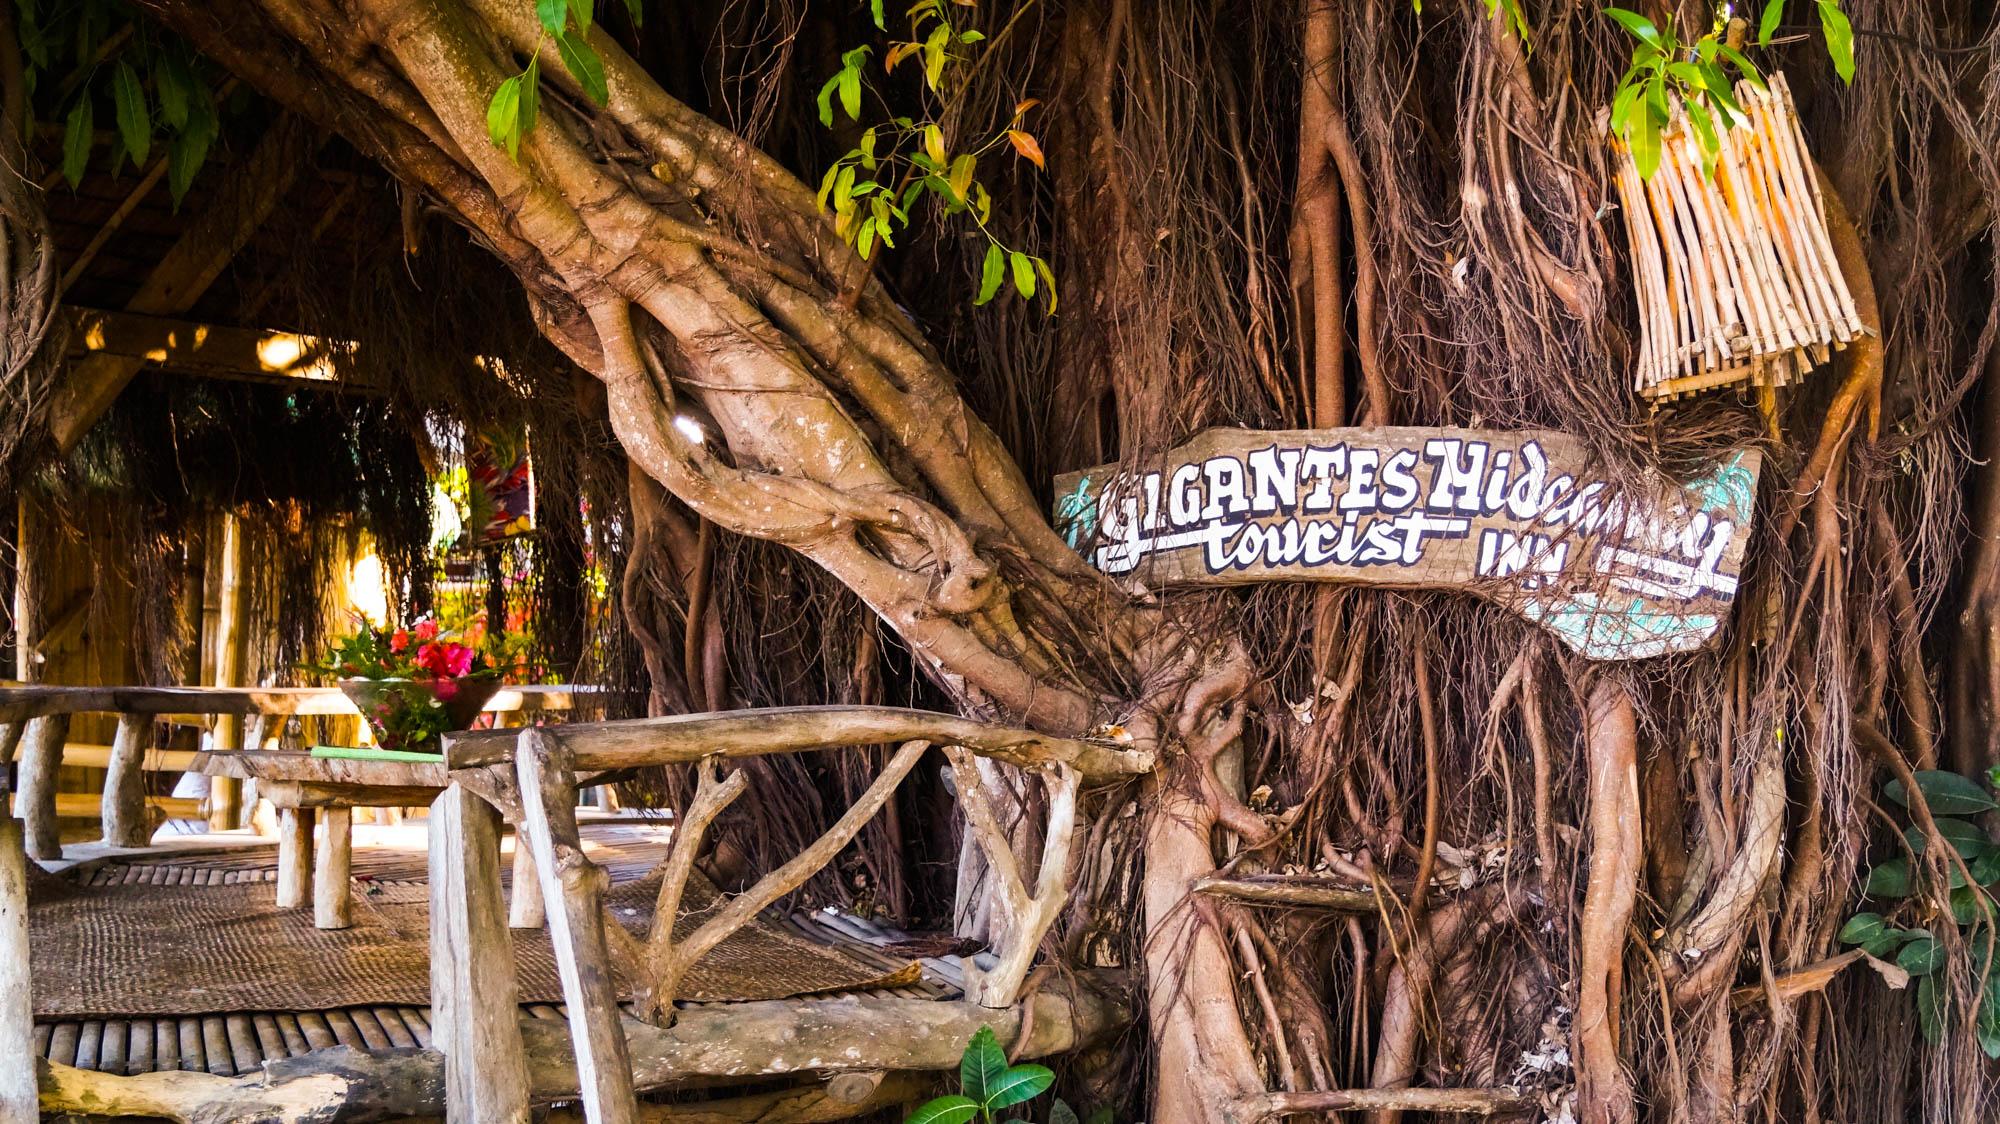 "菲律宾,Islas De Gigantes - Gigantes north Hideaway旅游酒店-照明beplay3体育官方下载"">              </noscript>              <img class="